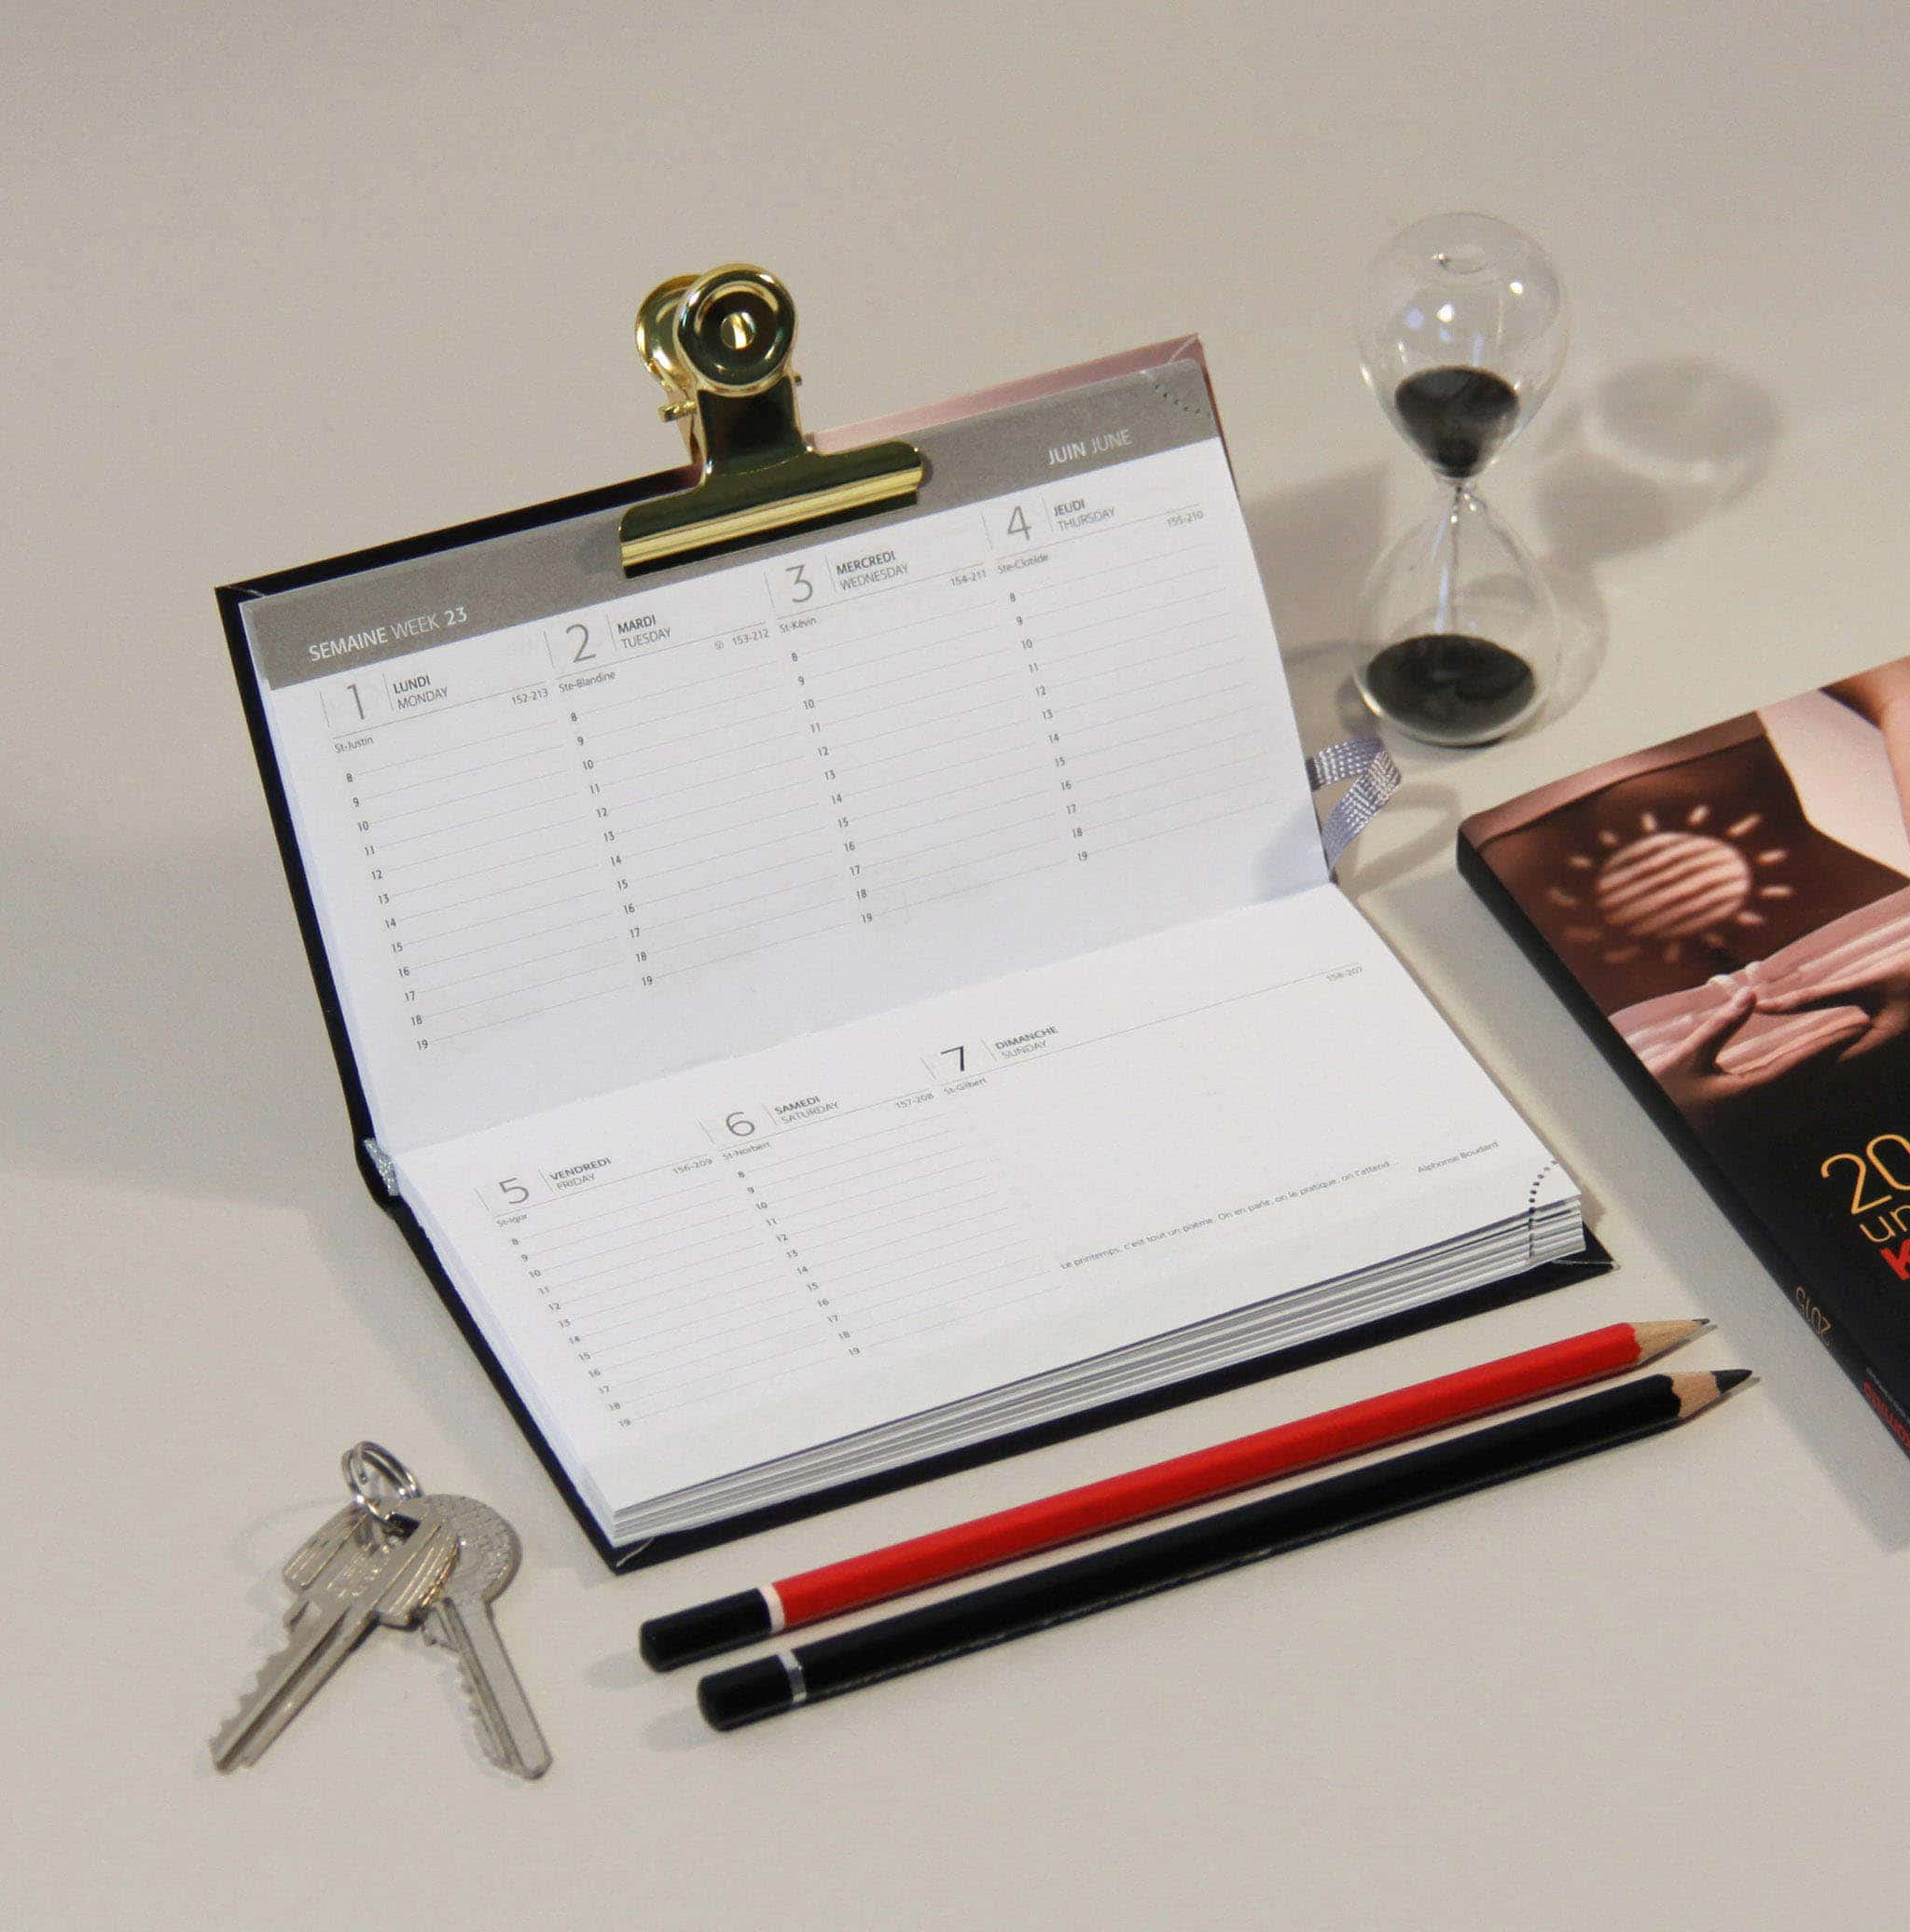 fabricant agenda entreprise & calendrier publicitaire professionnel